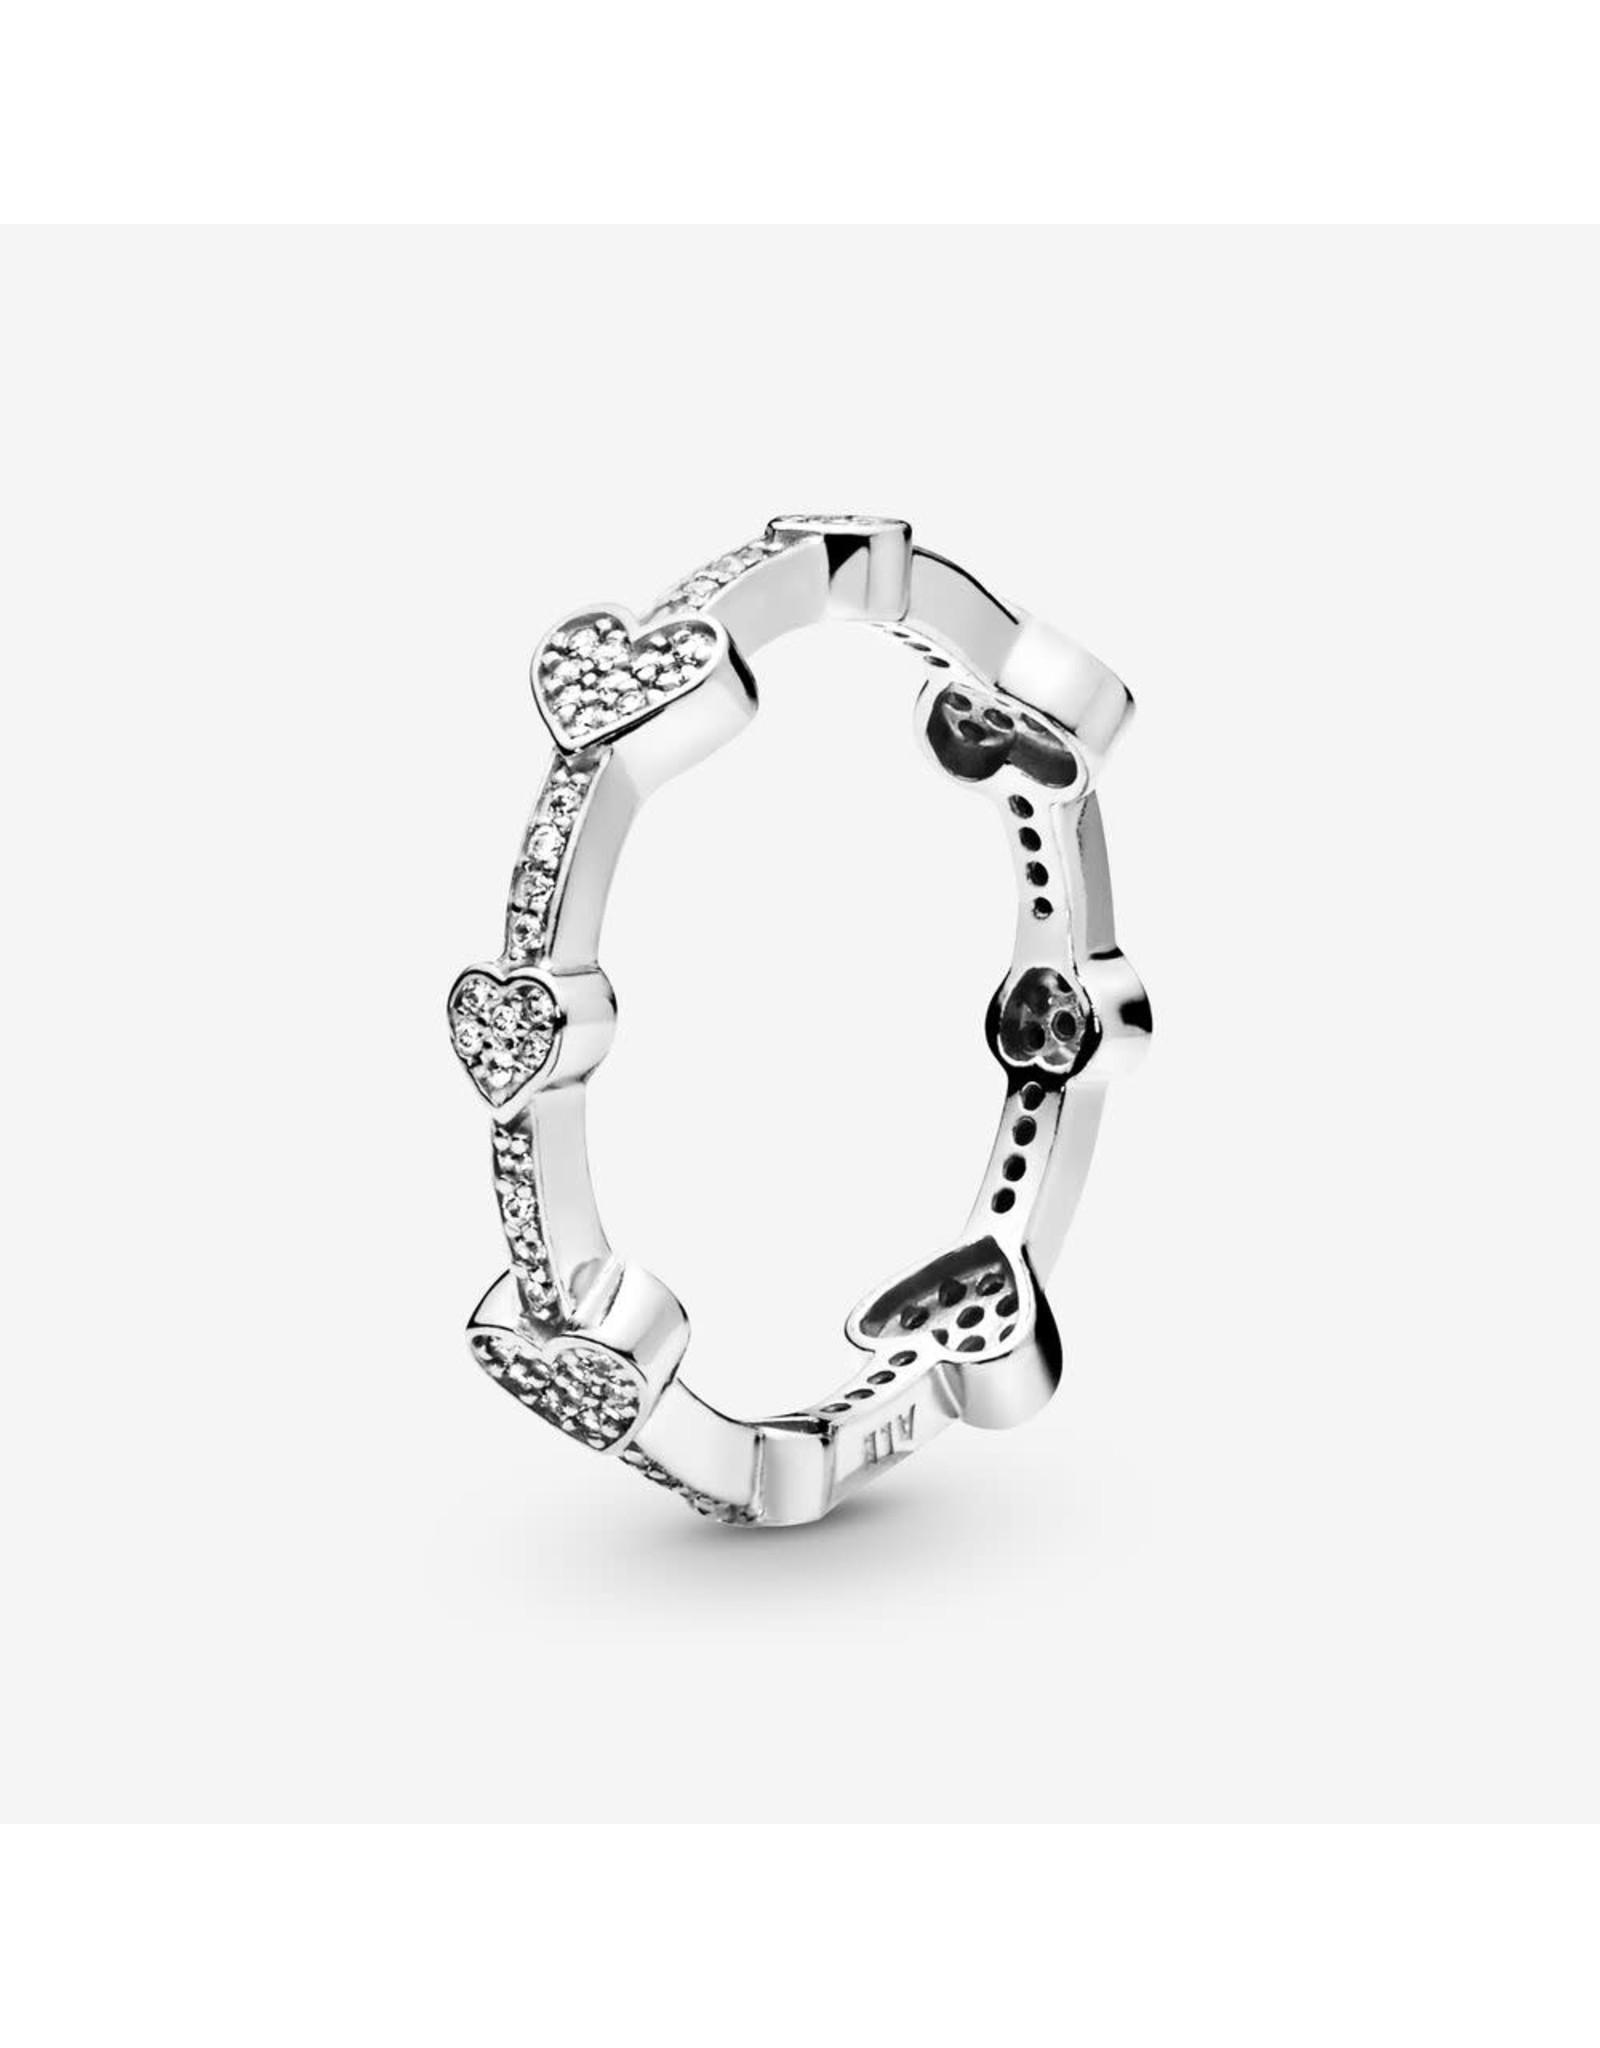 Pandora Pandora Ring, ( 197729CZ) Alluring Hearts, Clear CZ